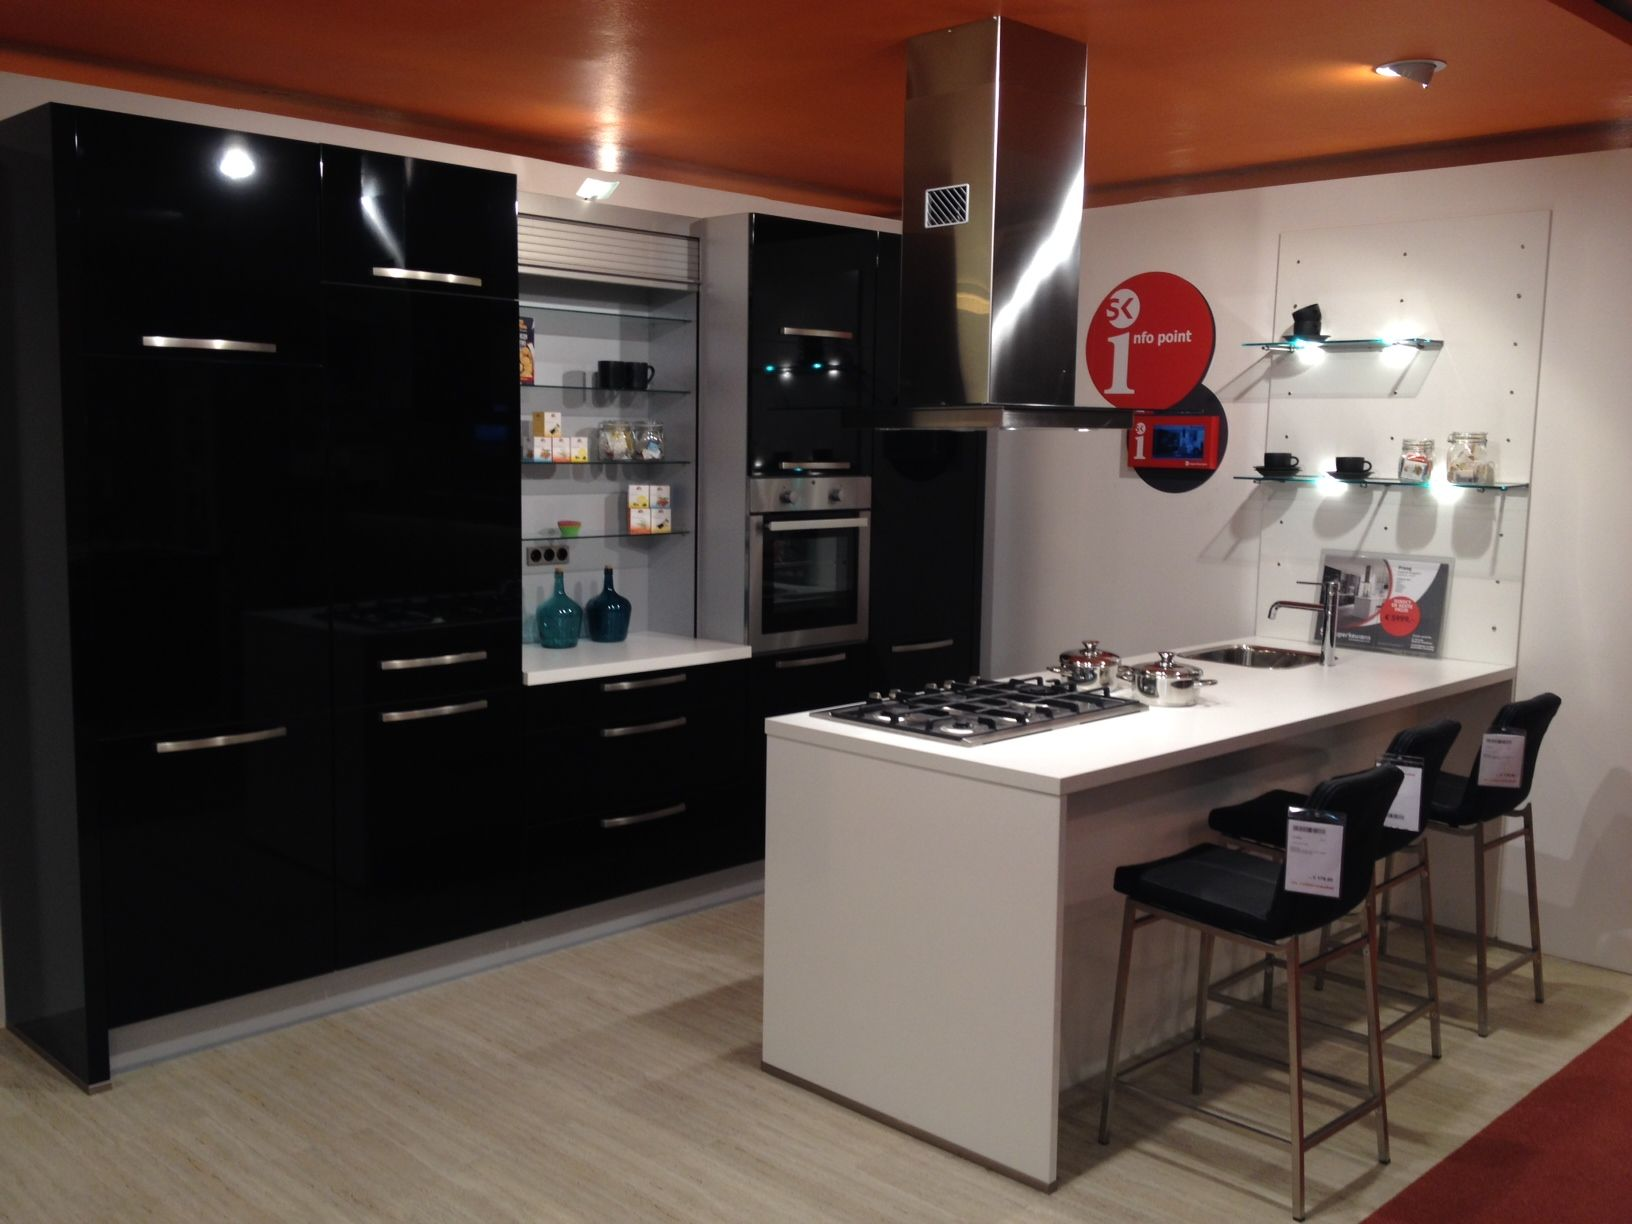 de grootste en voordeligste keukenwinkel van nederland nobilia praag hgl. Black Bedroom Furniture Sets. Home Design Ideas